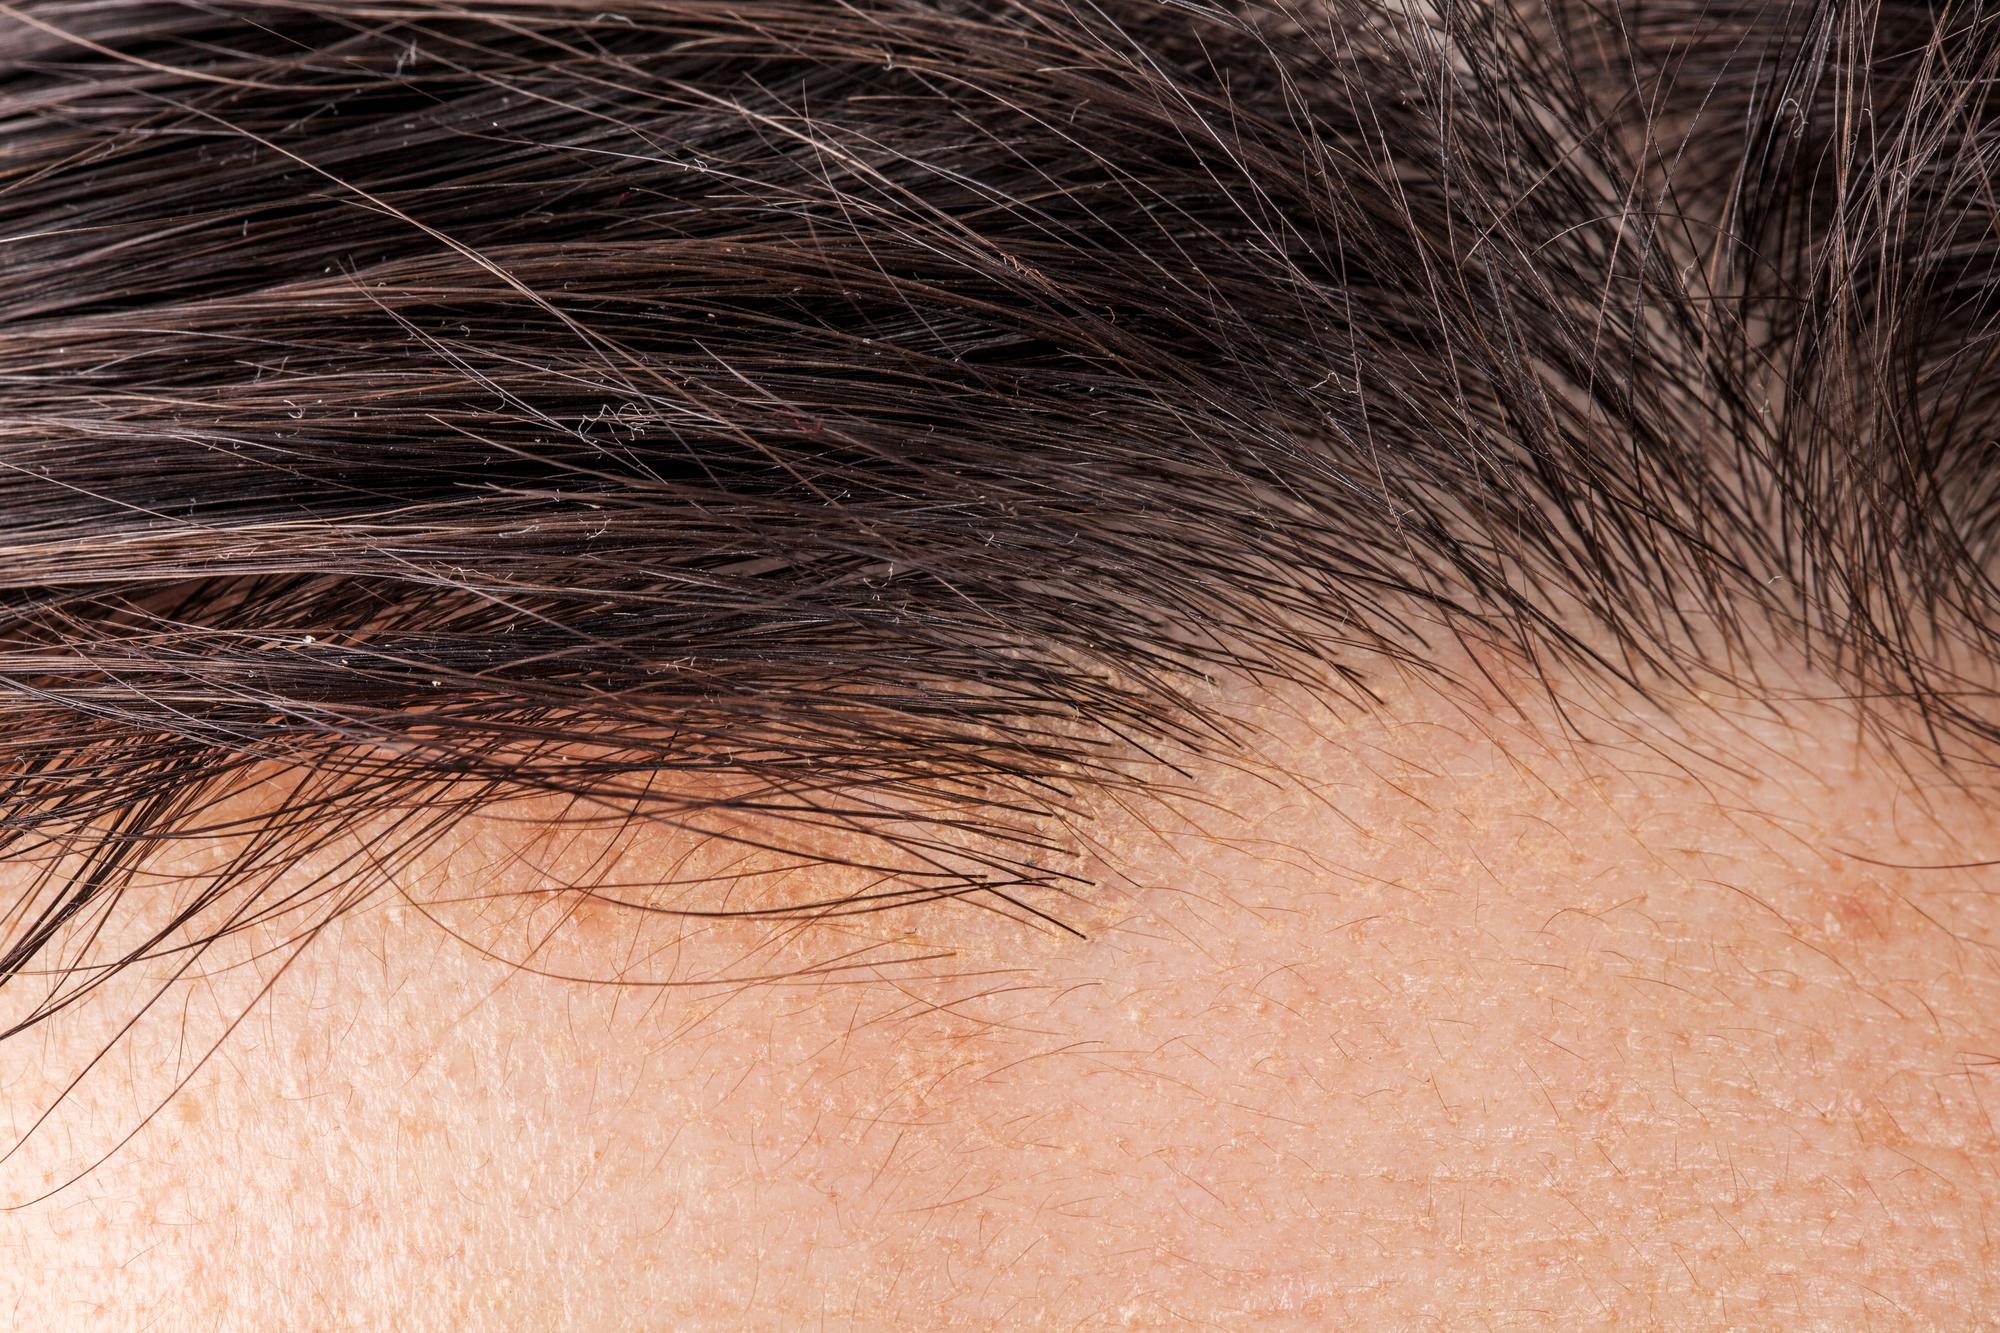 картинки три волосинки на голове руководством солдатова